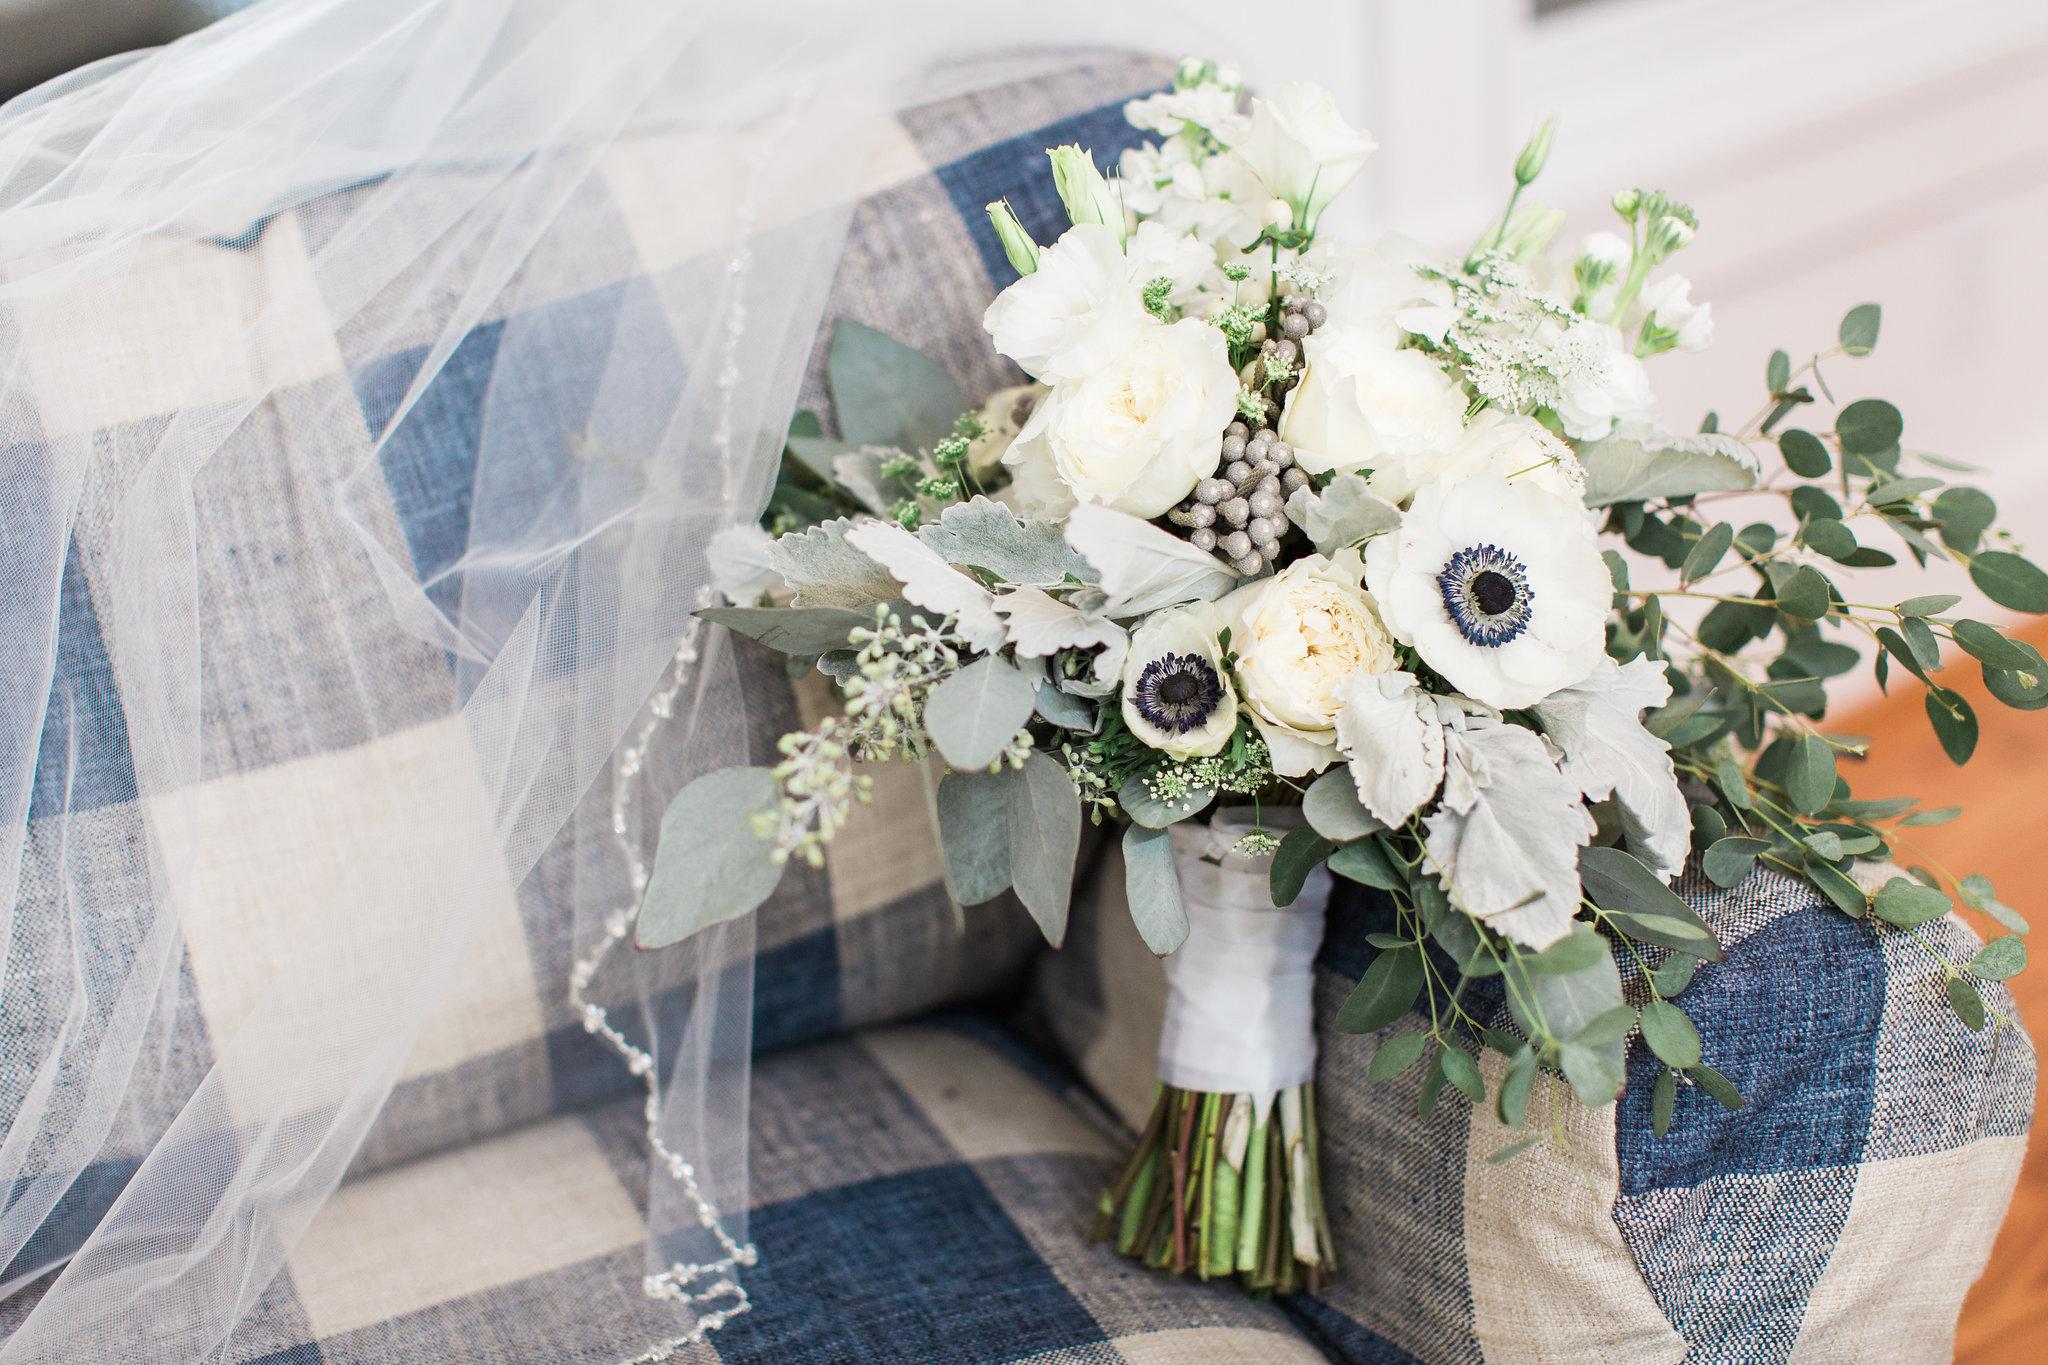 apt-b-photography-lauren-graham-oldfield-wedding-south-carolina-wedding-photographer-savannah-wedding-lowcountry-wedding-coastal-wedding-azalea-anns-florist-fall-wedding-1.JPG